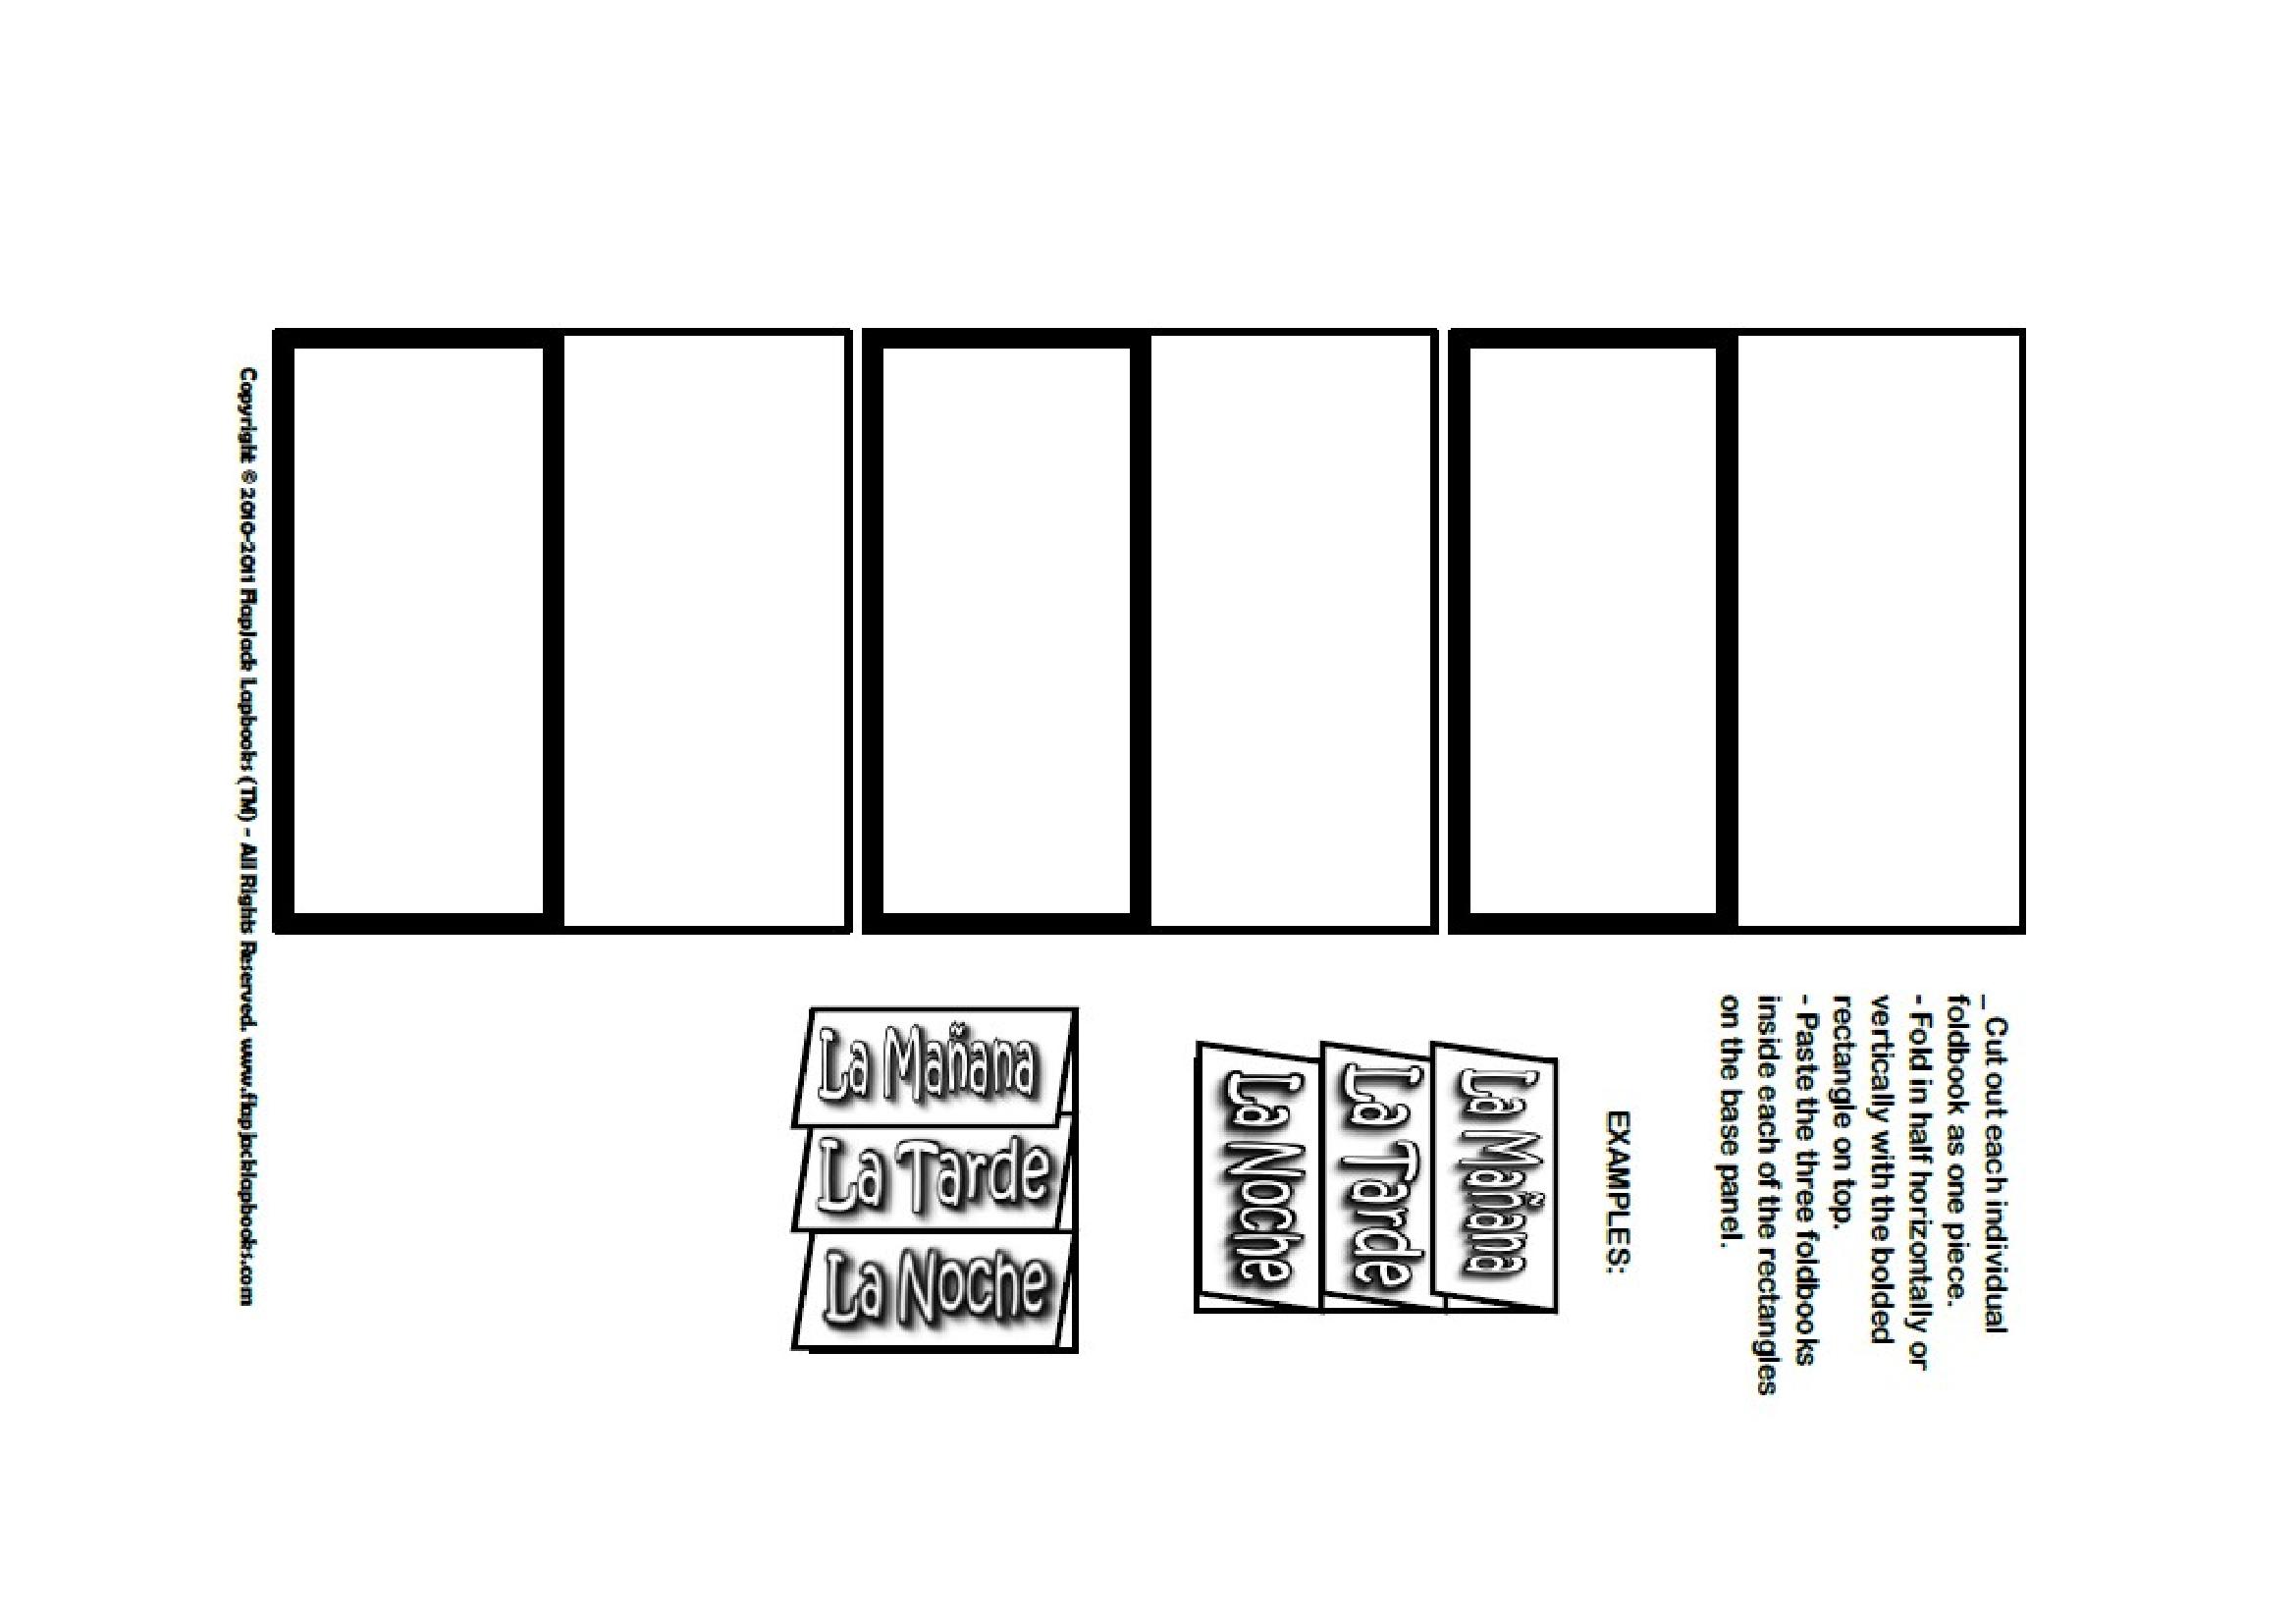 Plantillas lapbook - Education | lapbook | Pinterest | School